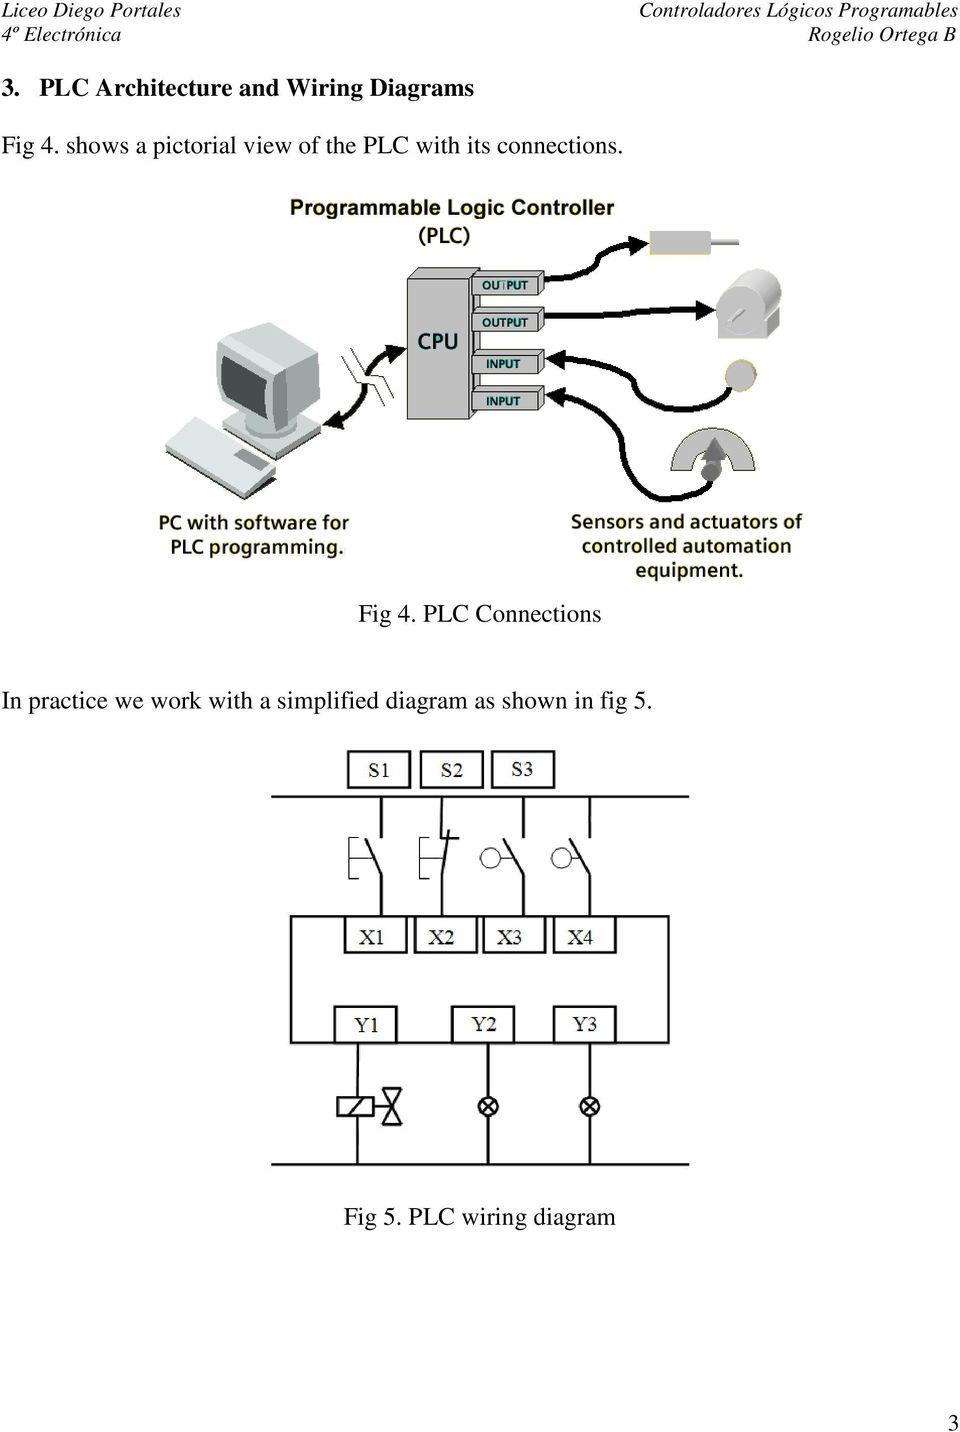 Posh Cdi 6 Wire Wiring Diagram | New Wiring Diagram 2018